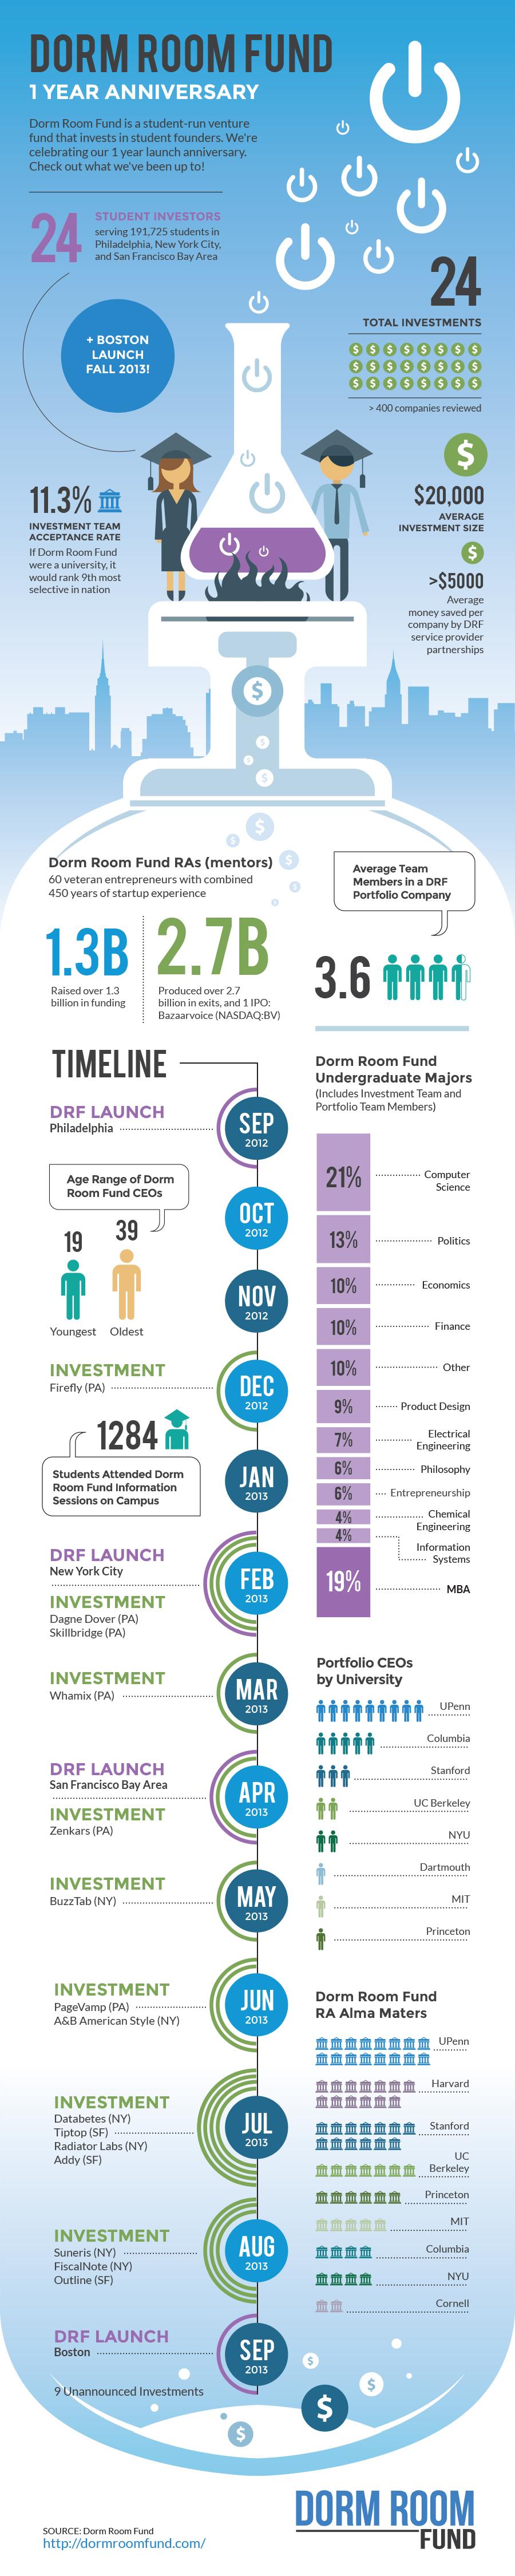 Dorm Room Fund One Year Anniversary